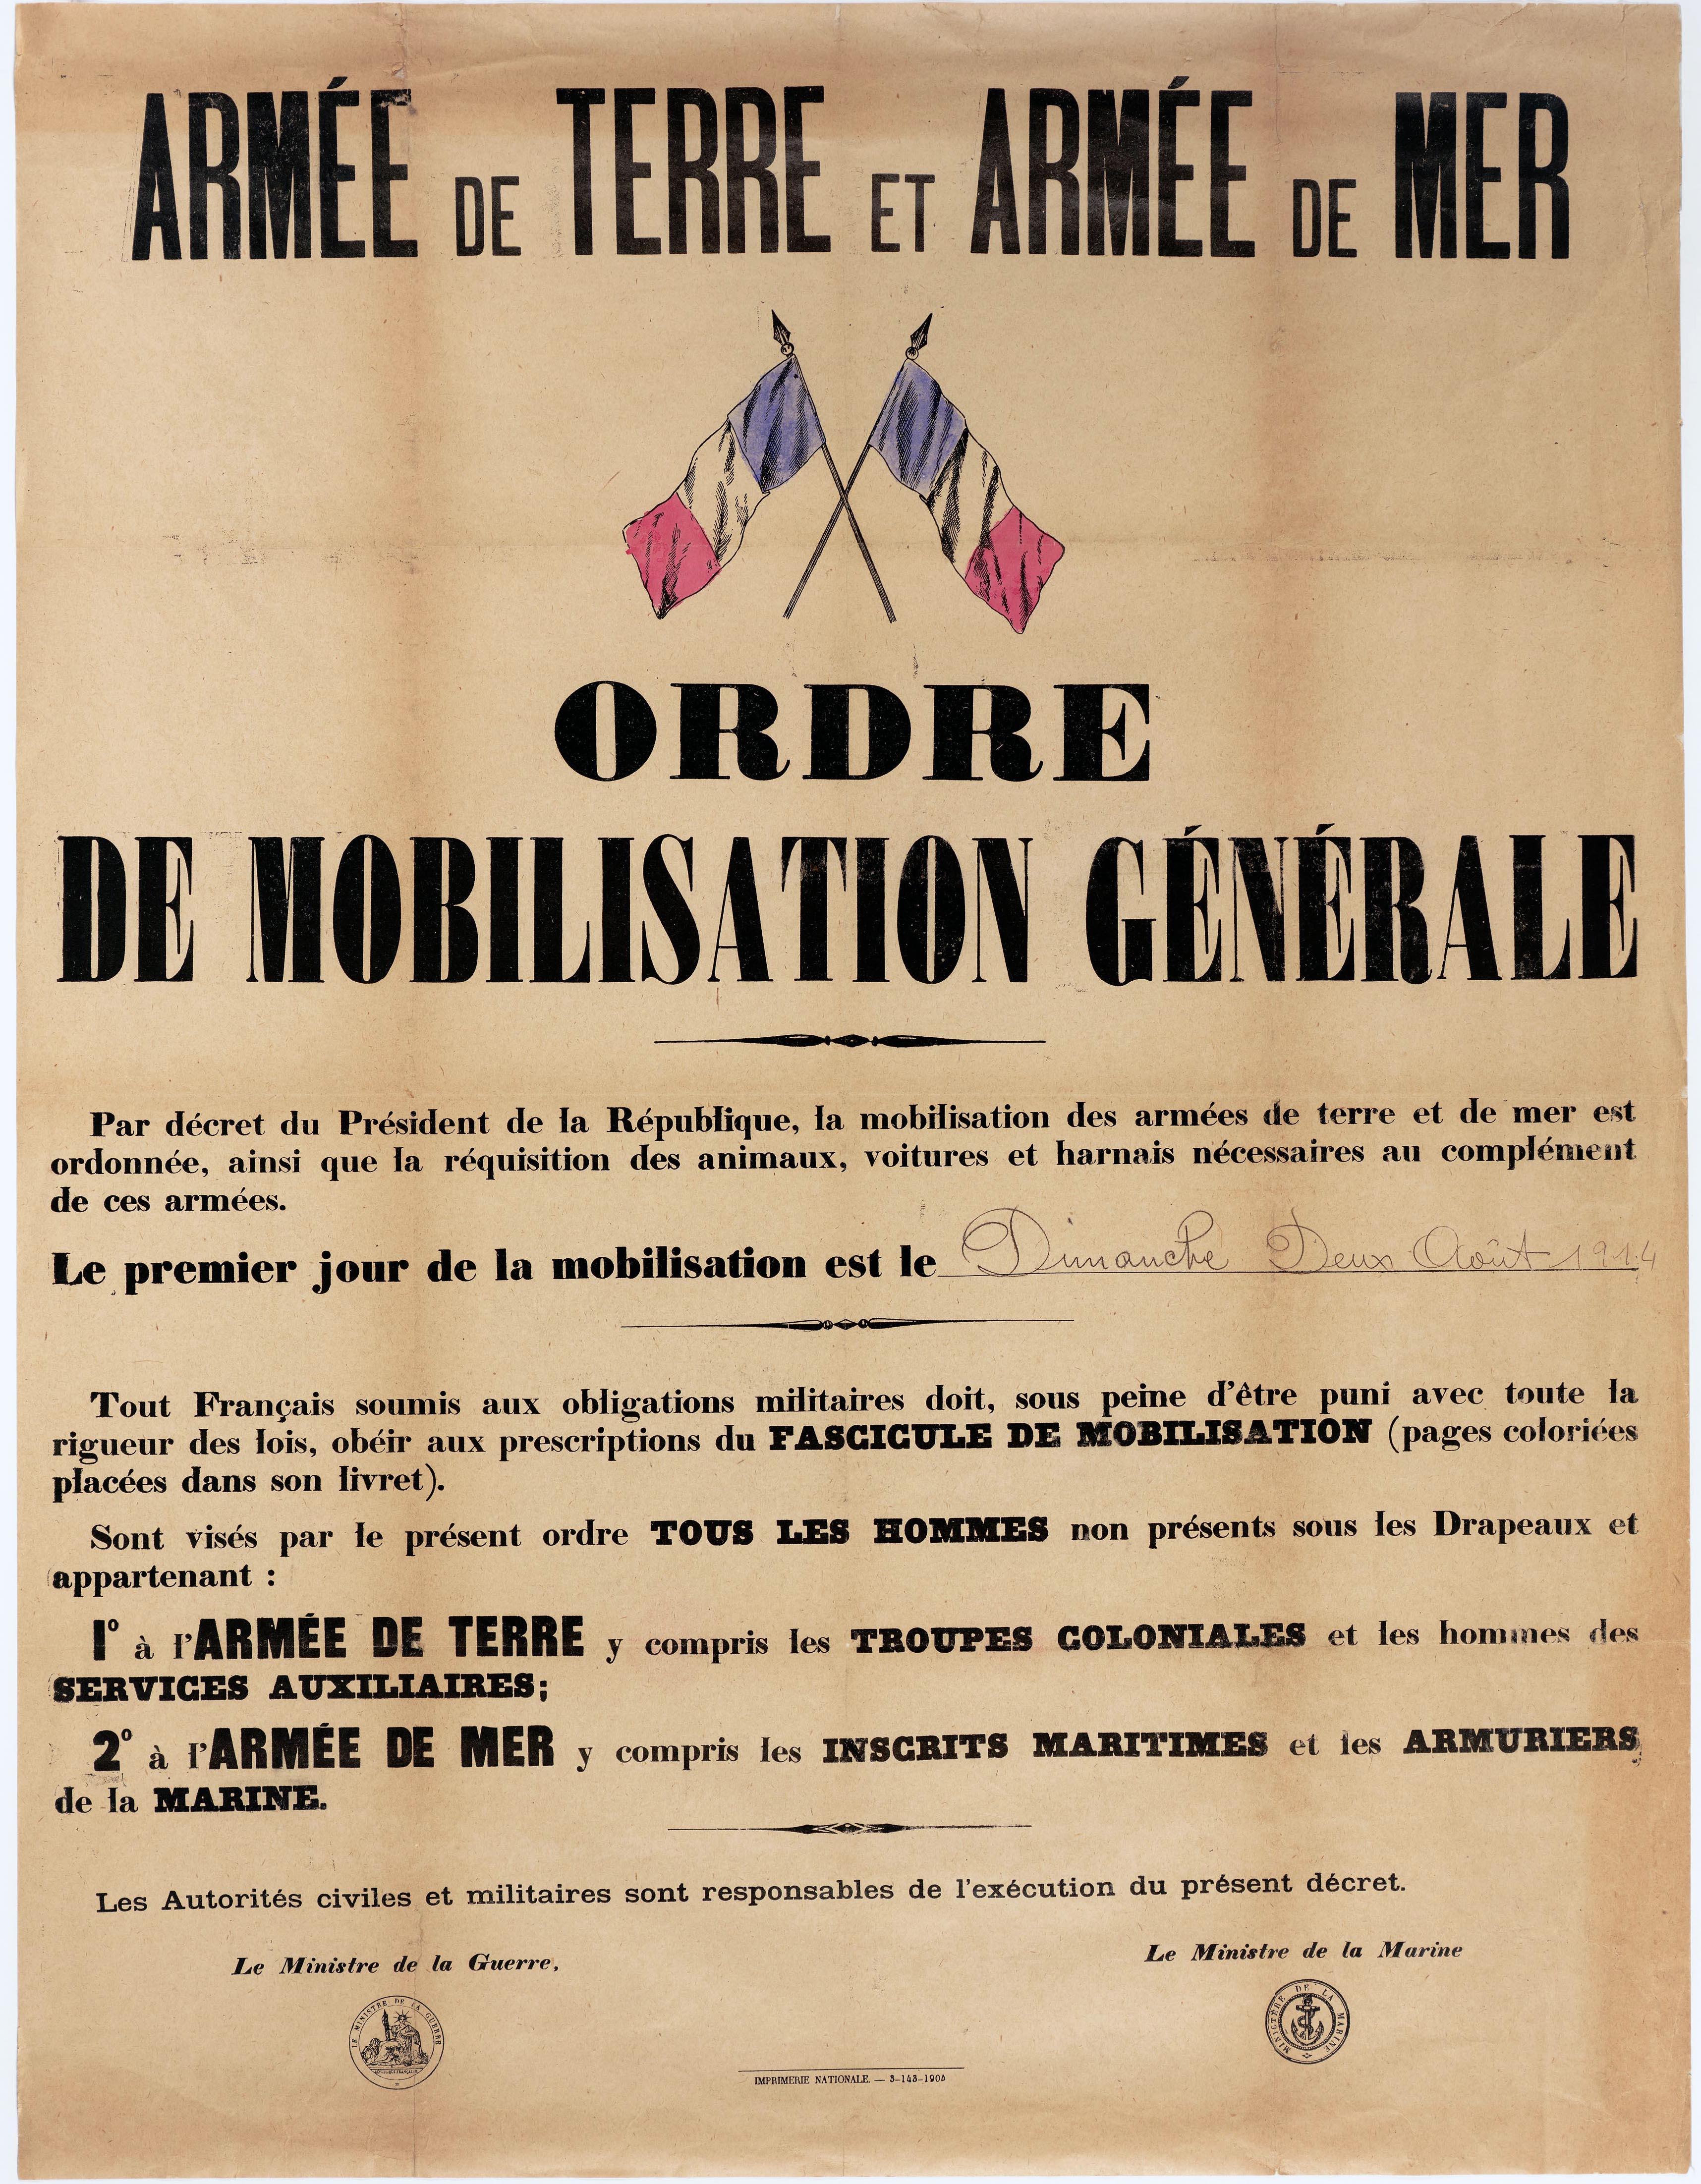 "https://upload.wikimedia.org/wikipedia/commons/d/d0/Affiche_""ordre_de_mobilisation_générale""_1_-_Archives_Nationales_-_AE-II-3598.jpg"